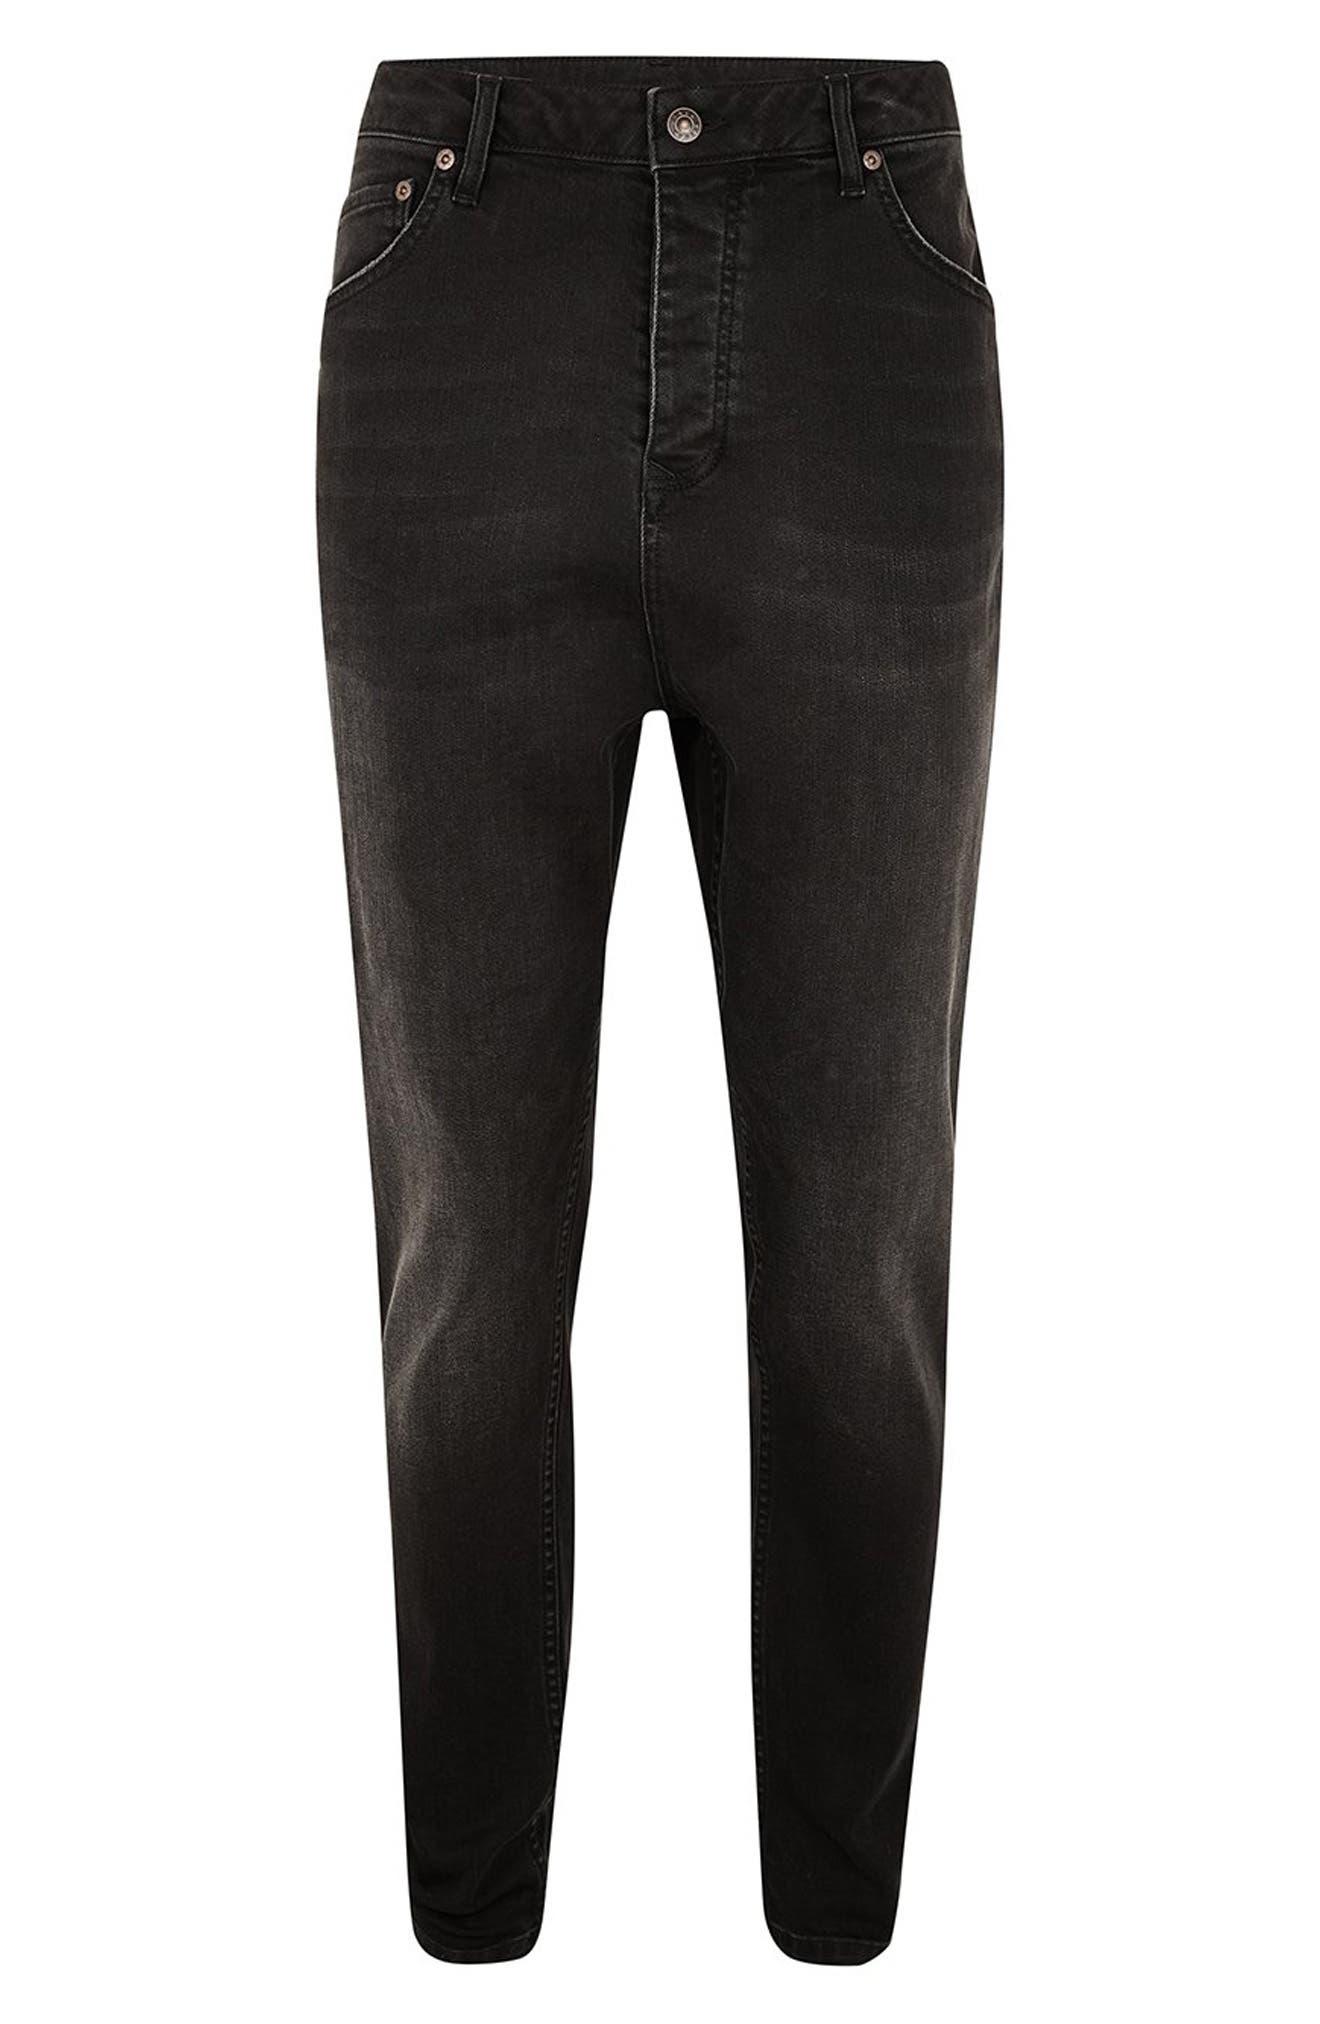 Topshop Jogger Skinny Jeans,                             Alternate thumbnail 4, color,                             BLACK